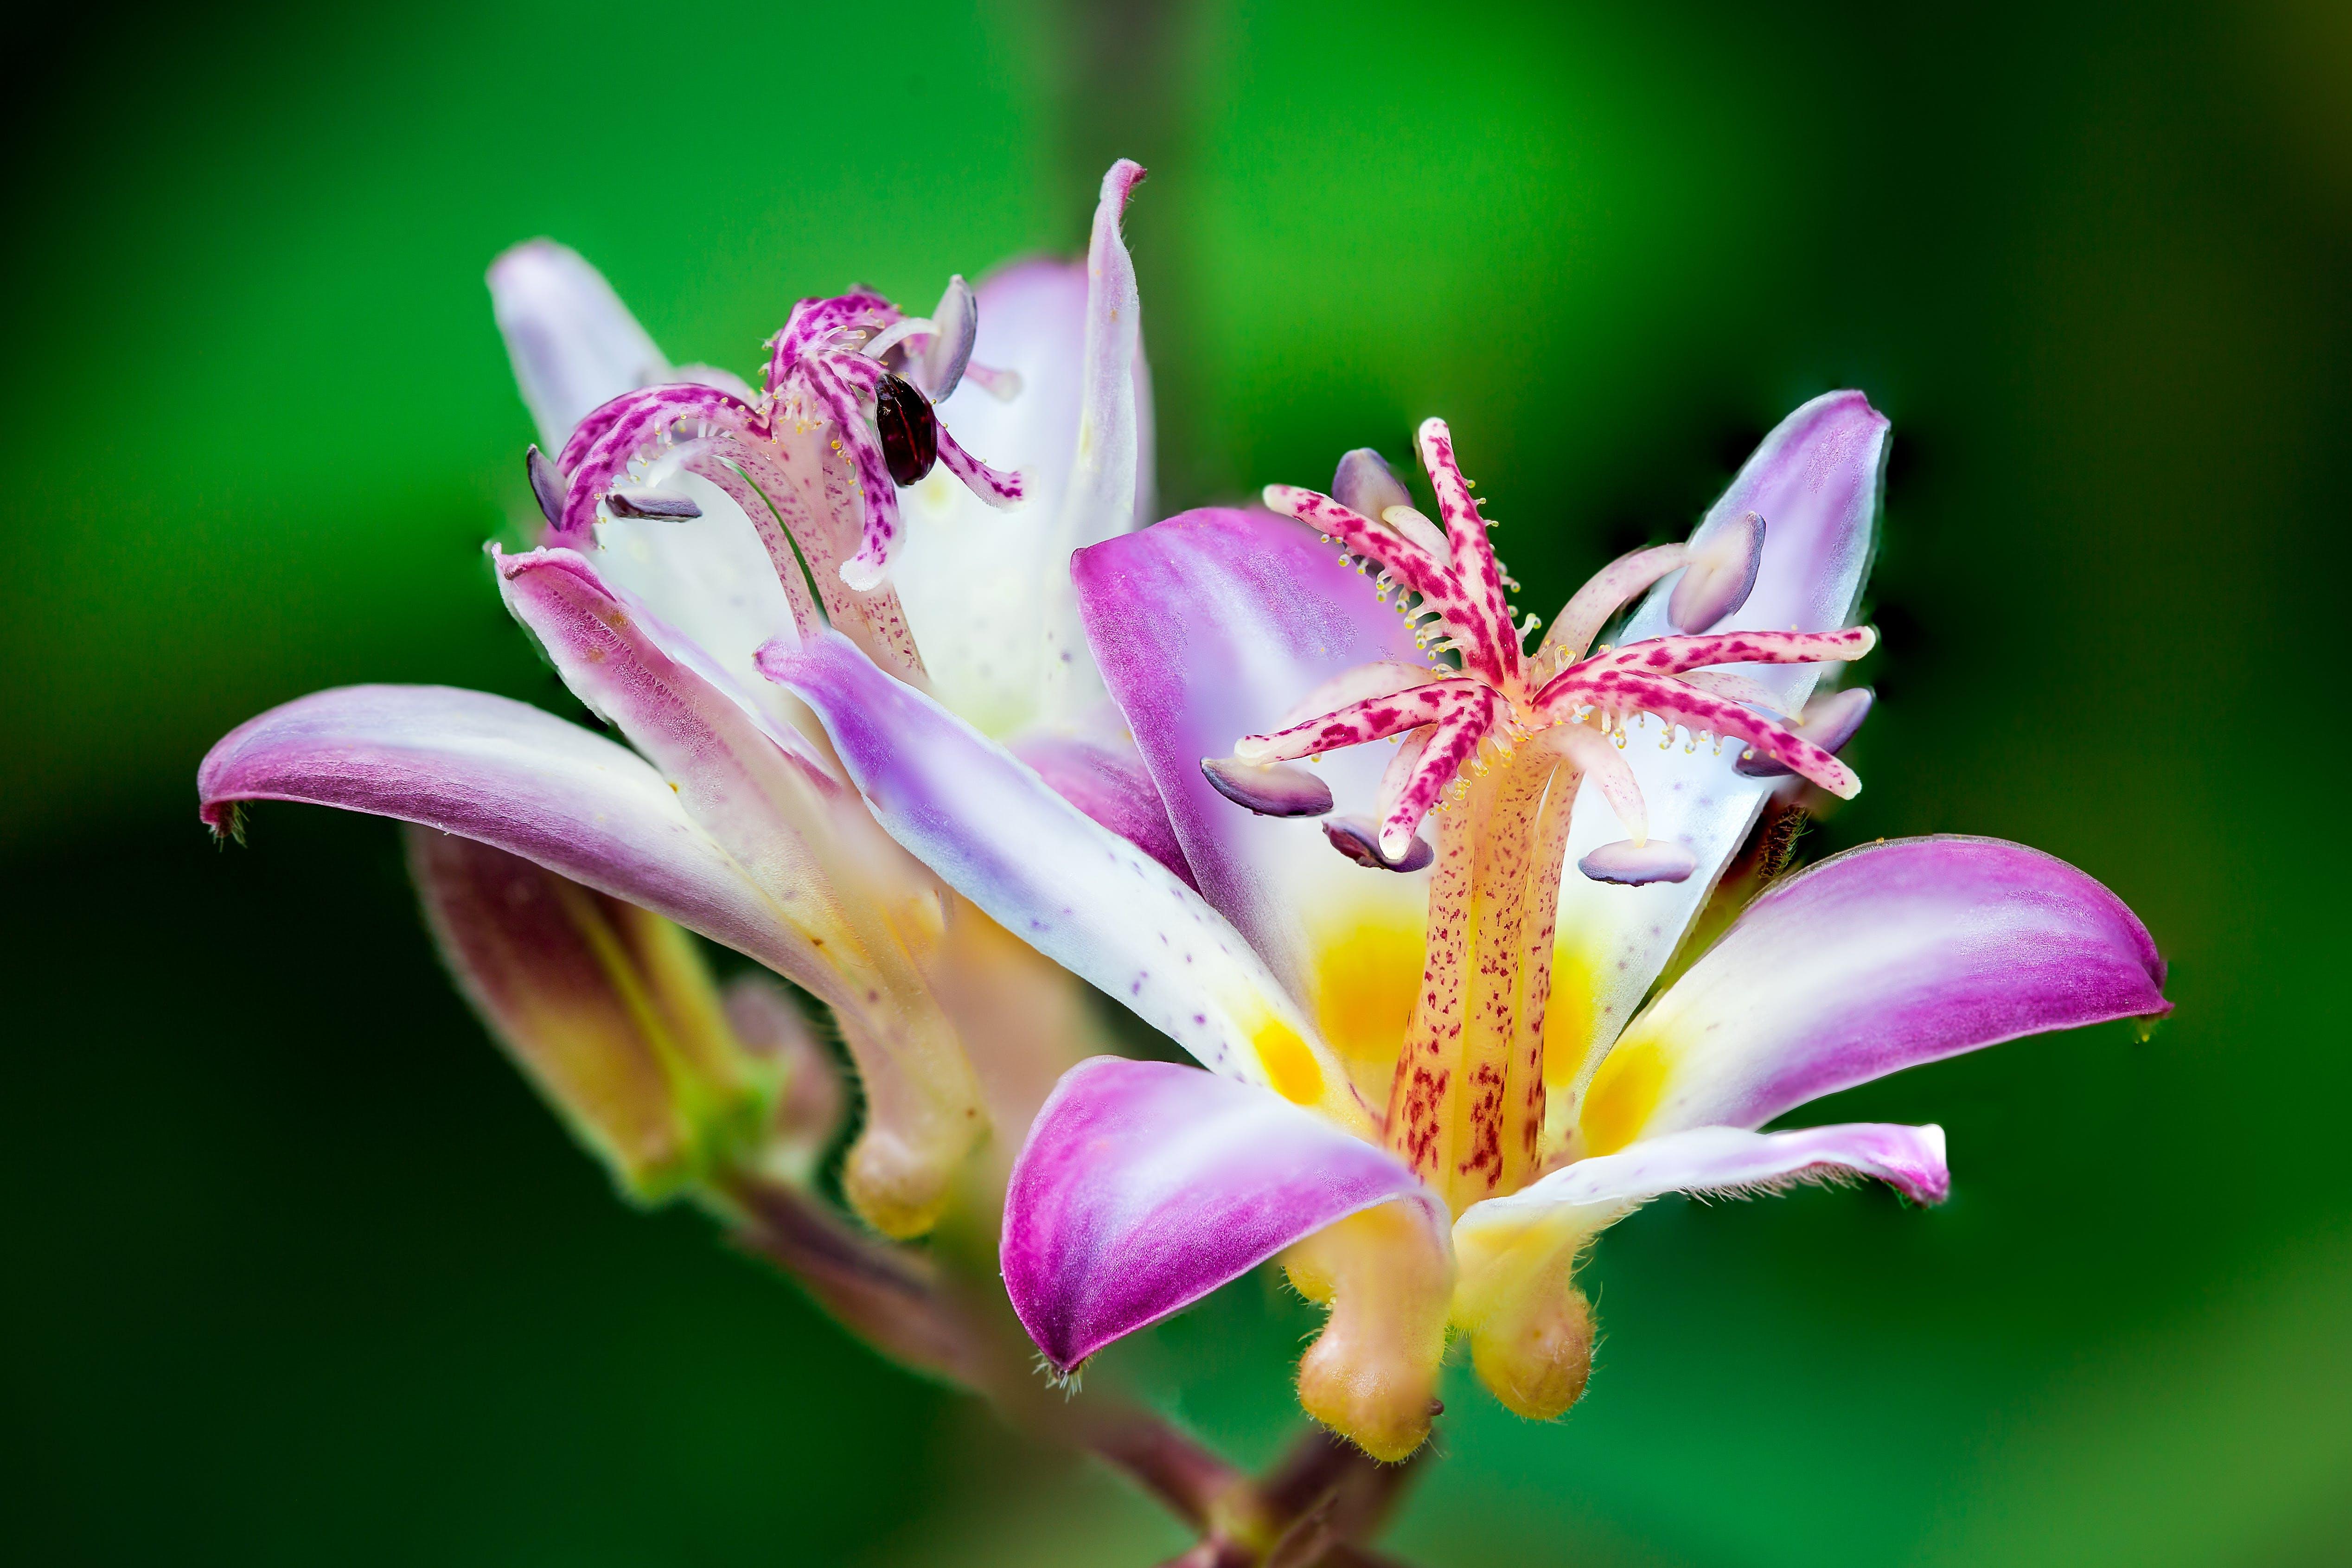 Closeup Photo of Purple-and-white Petaled Flowers